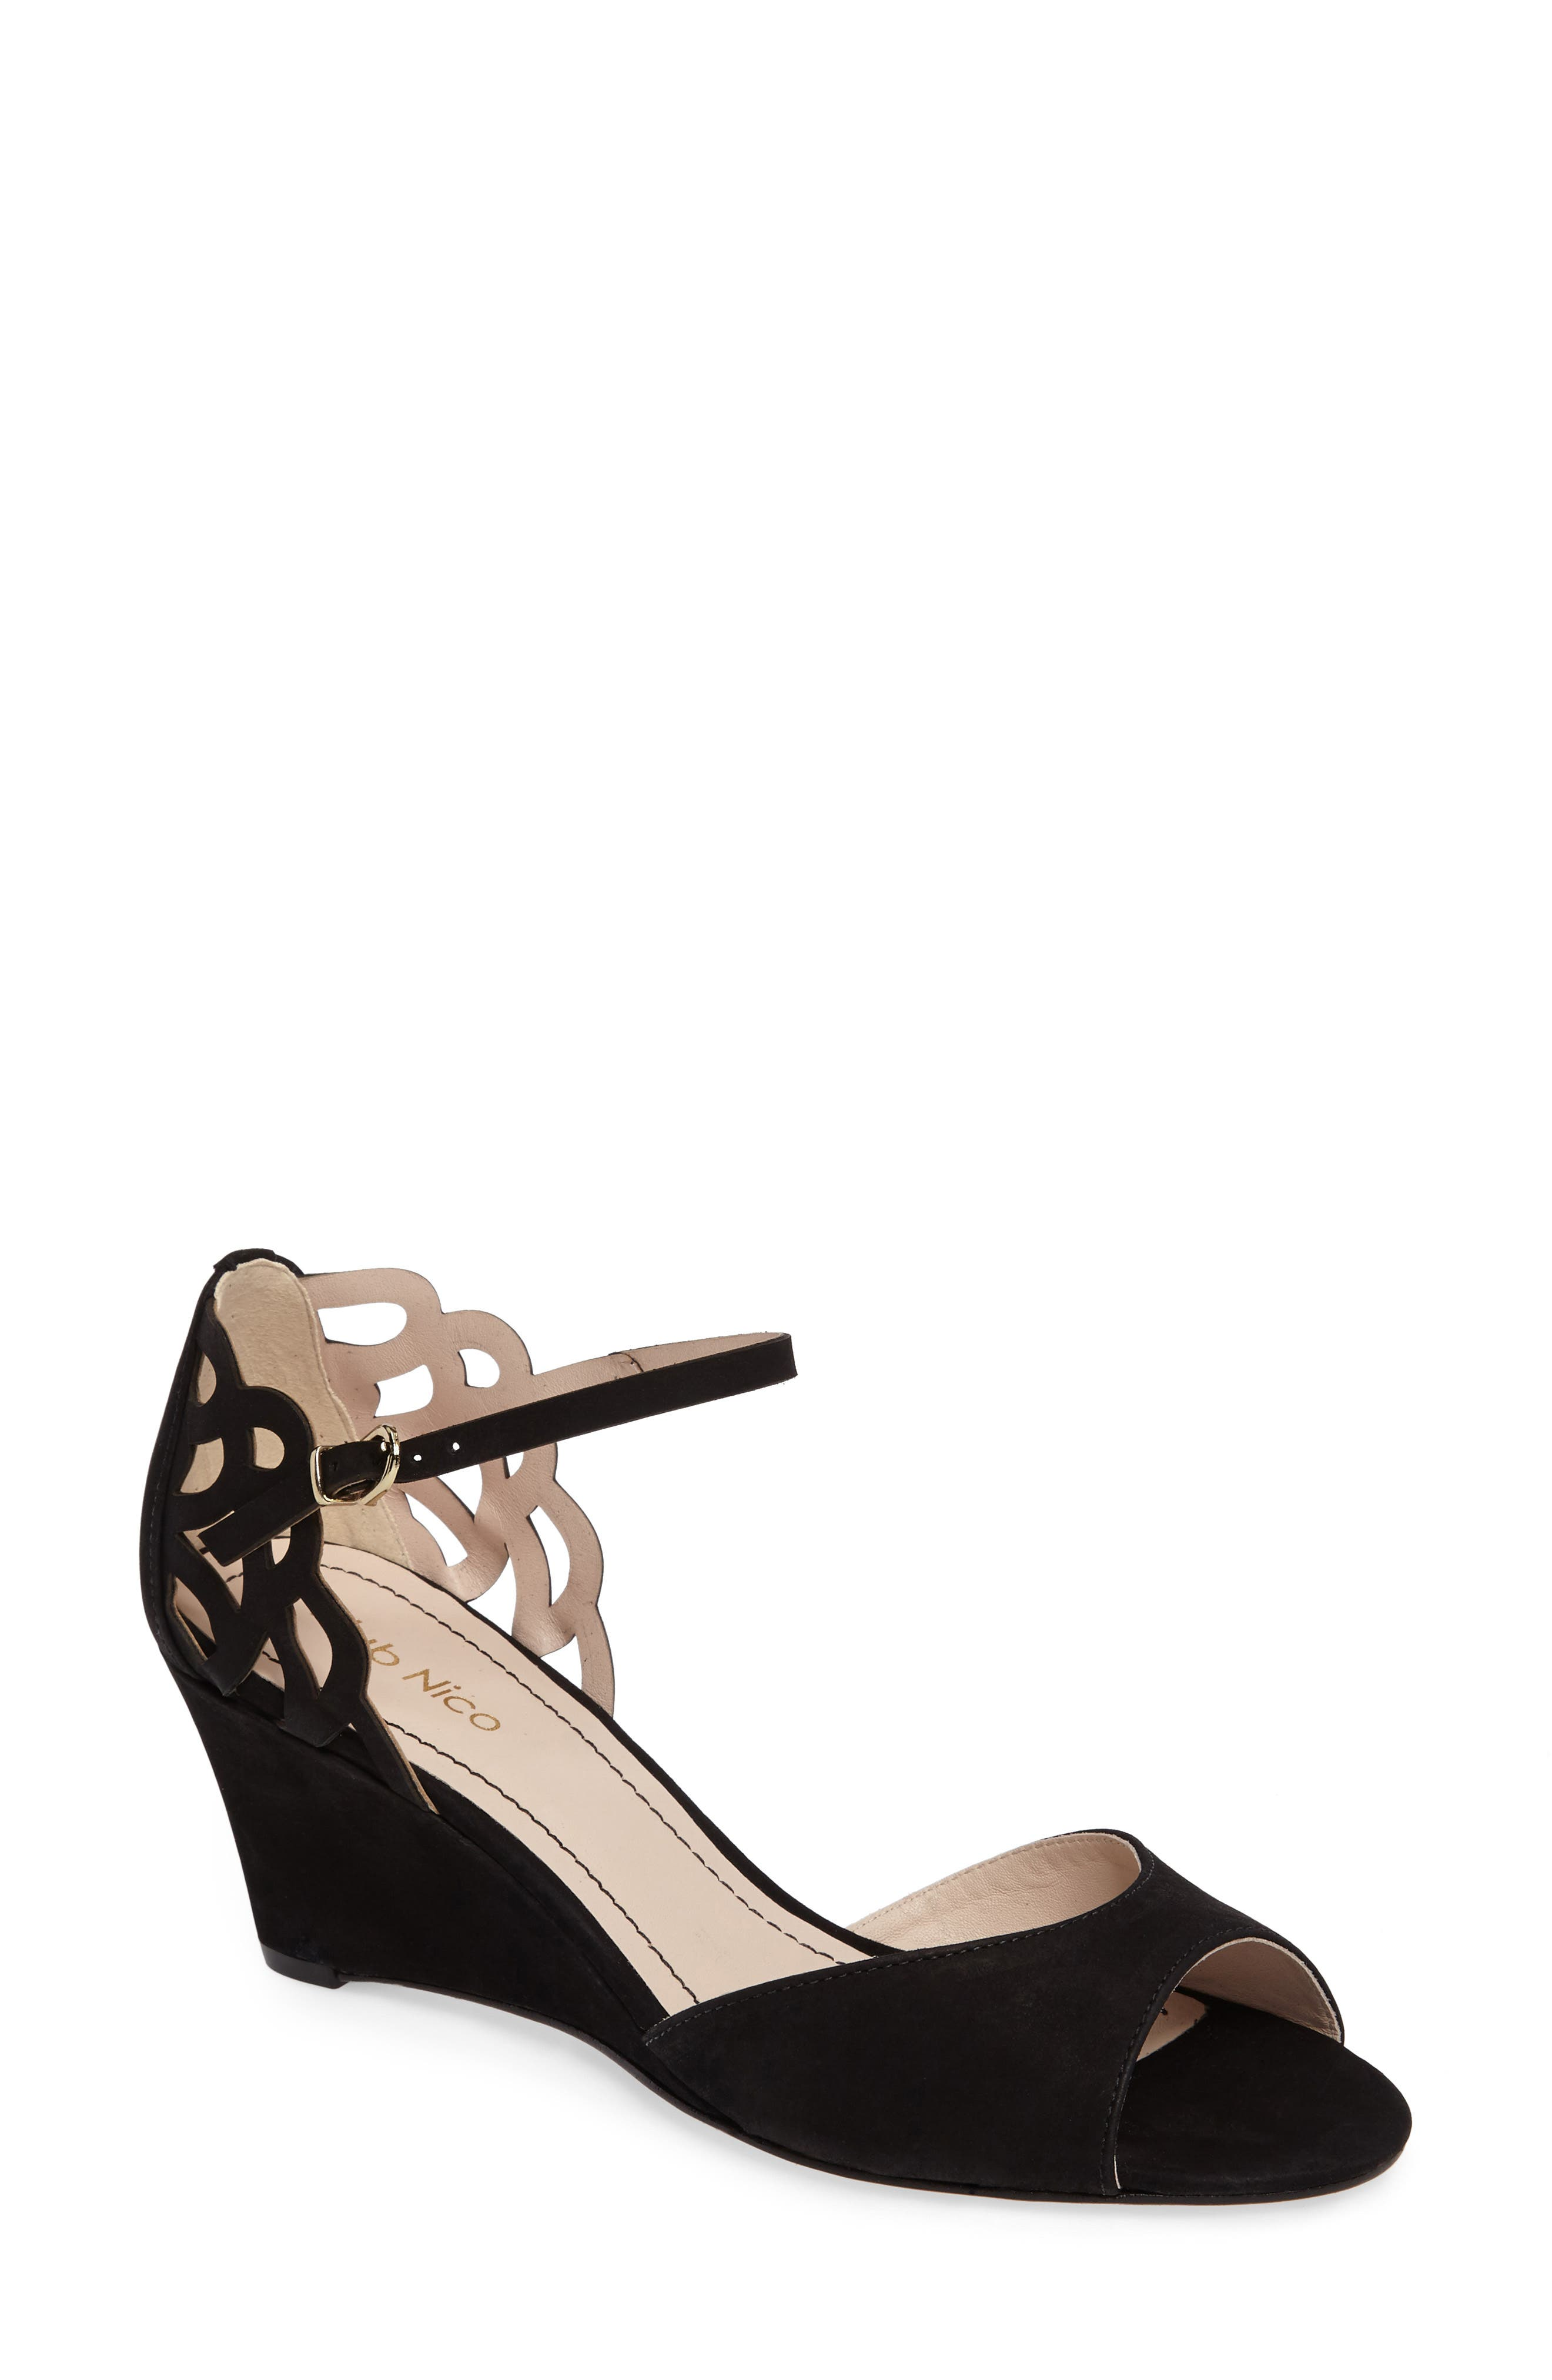 Karina Cutout Sandal,                         Main,                         color, Black Nubuck Leather